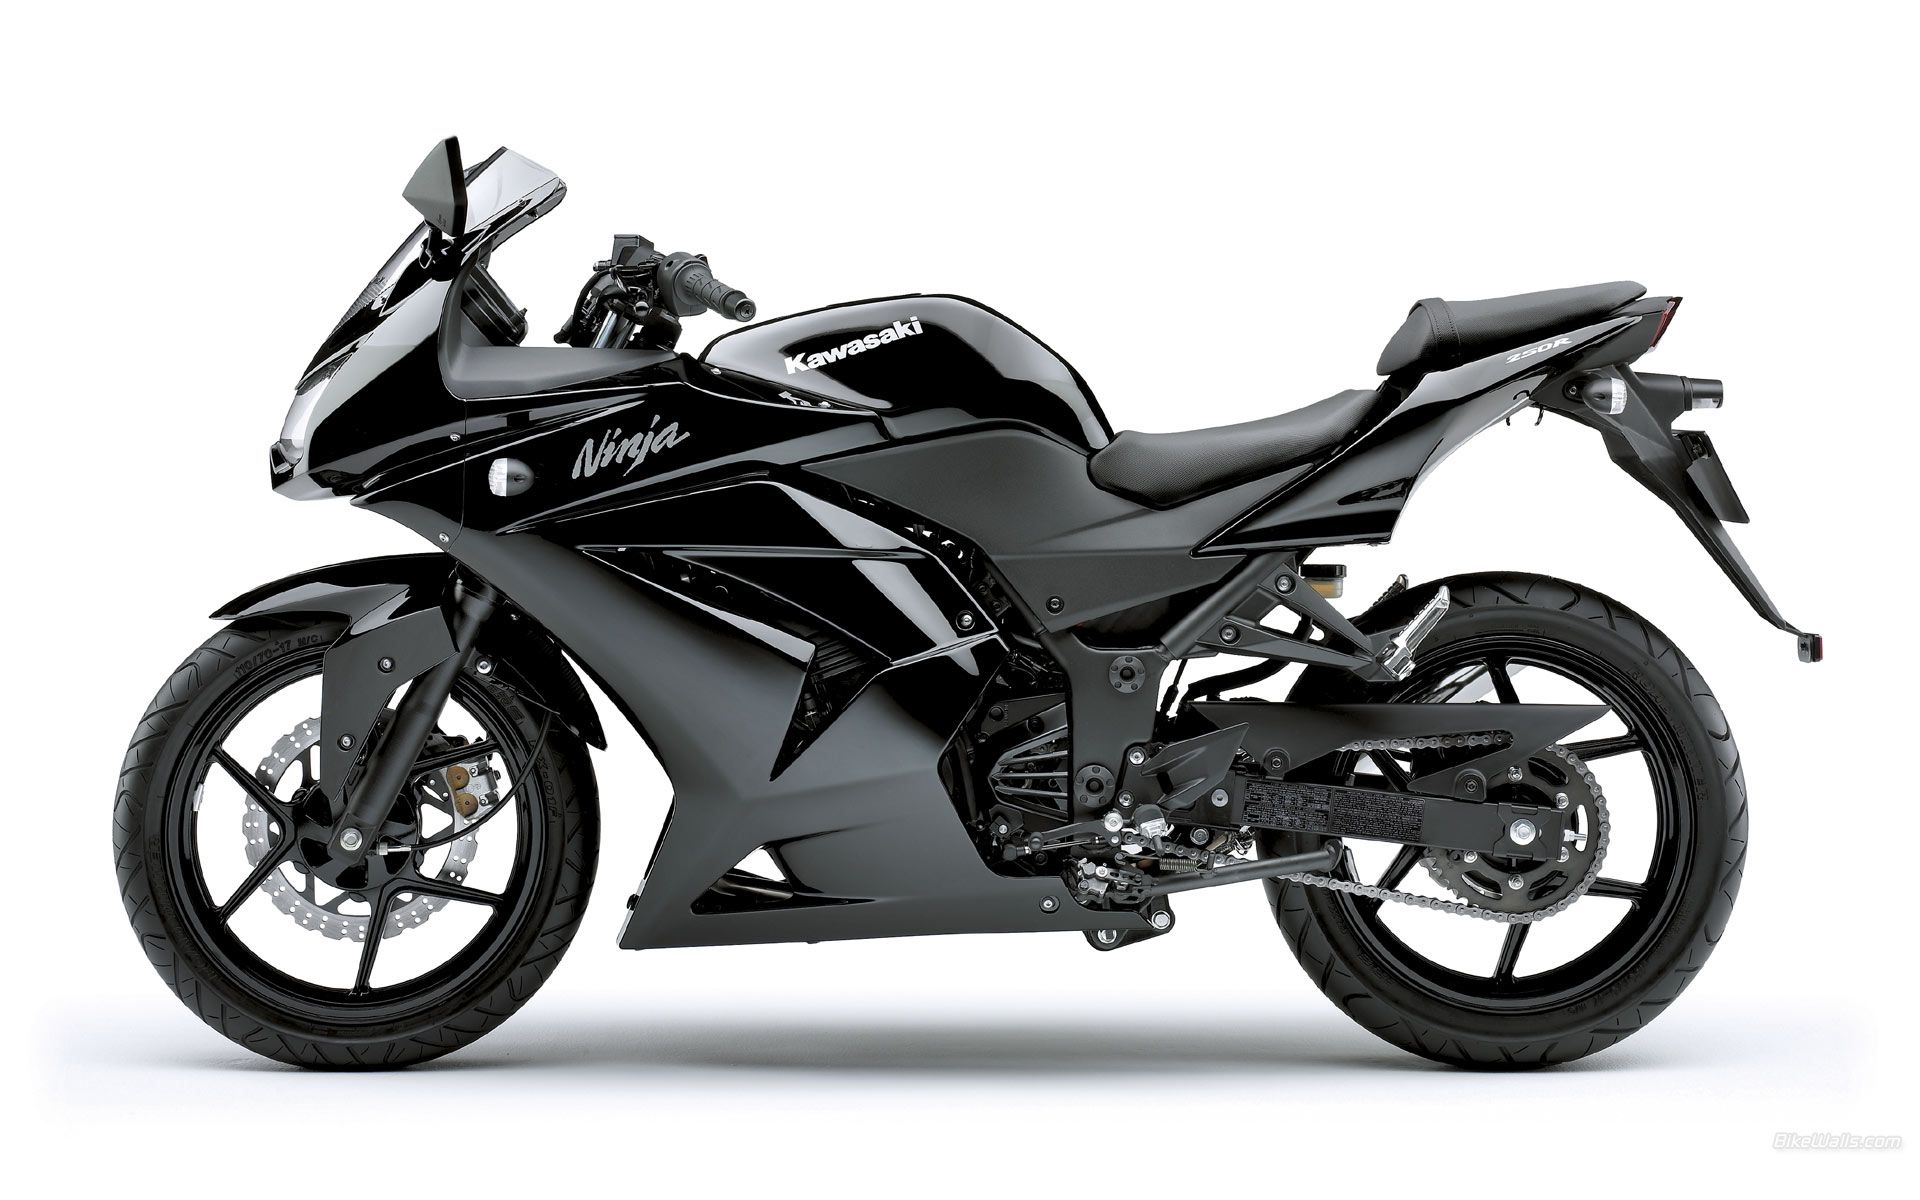 Kawasaki Ninja 250r Kawasaki Ninja Blue Motorcycle Baby Bike